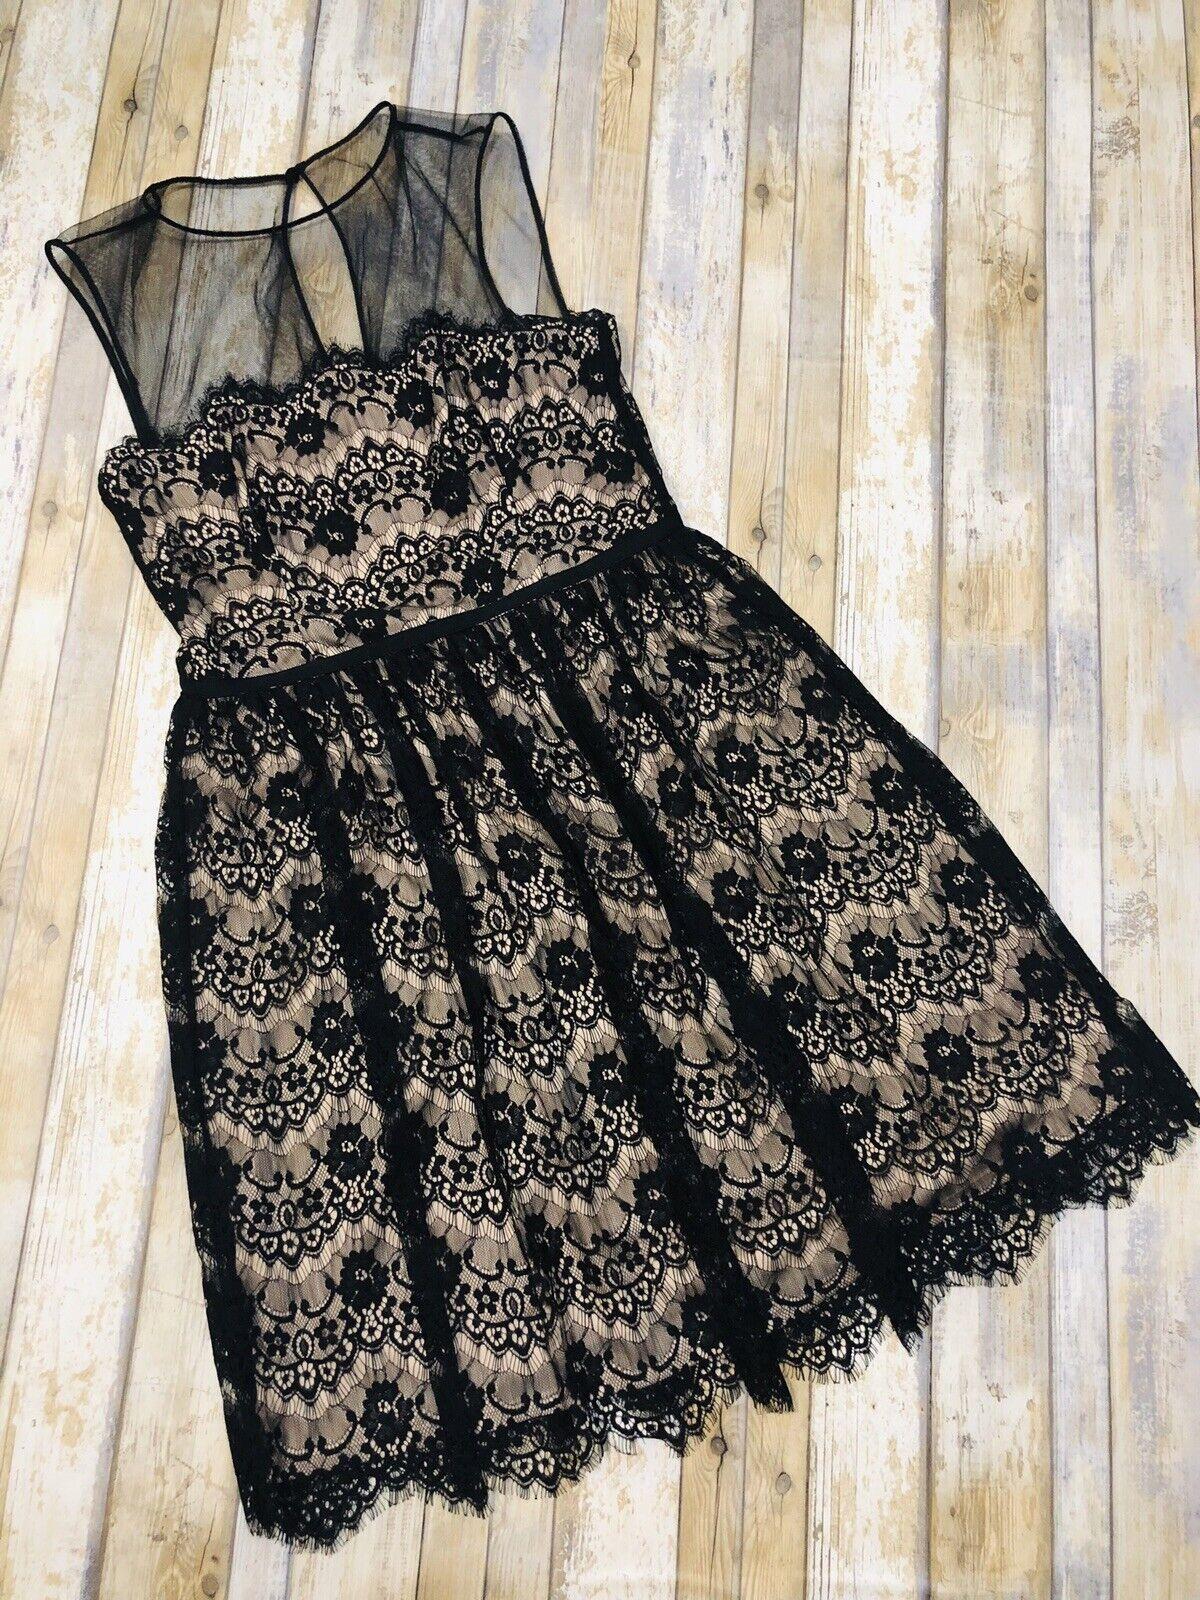 Maggy London lace dress 8. Originally